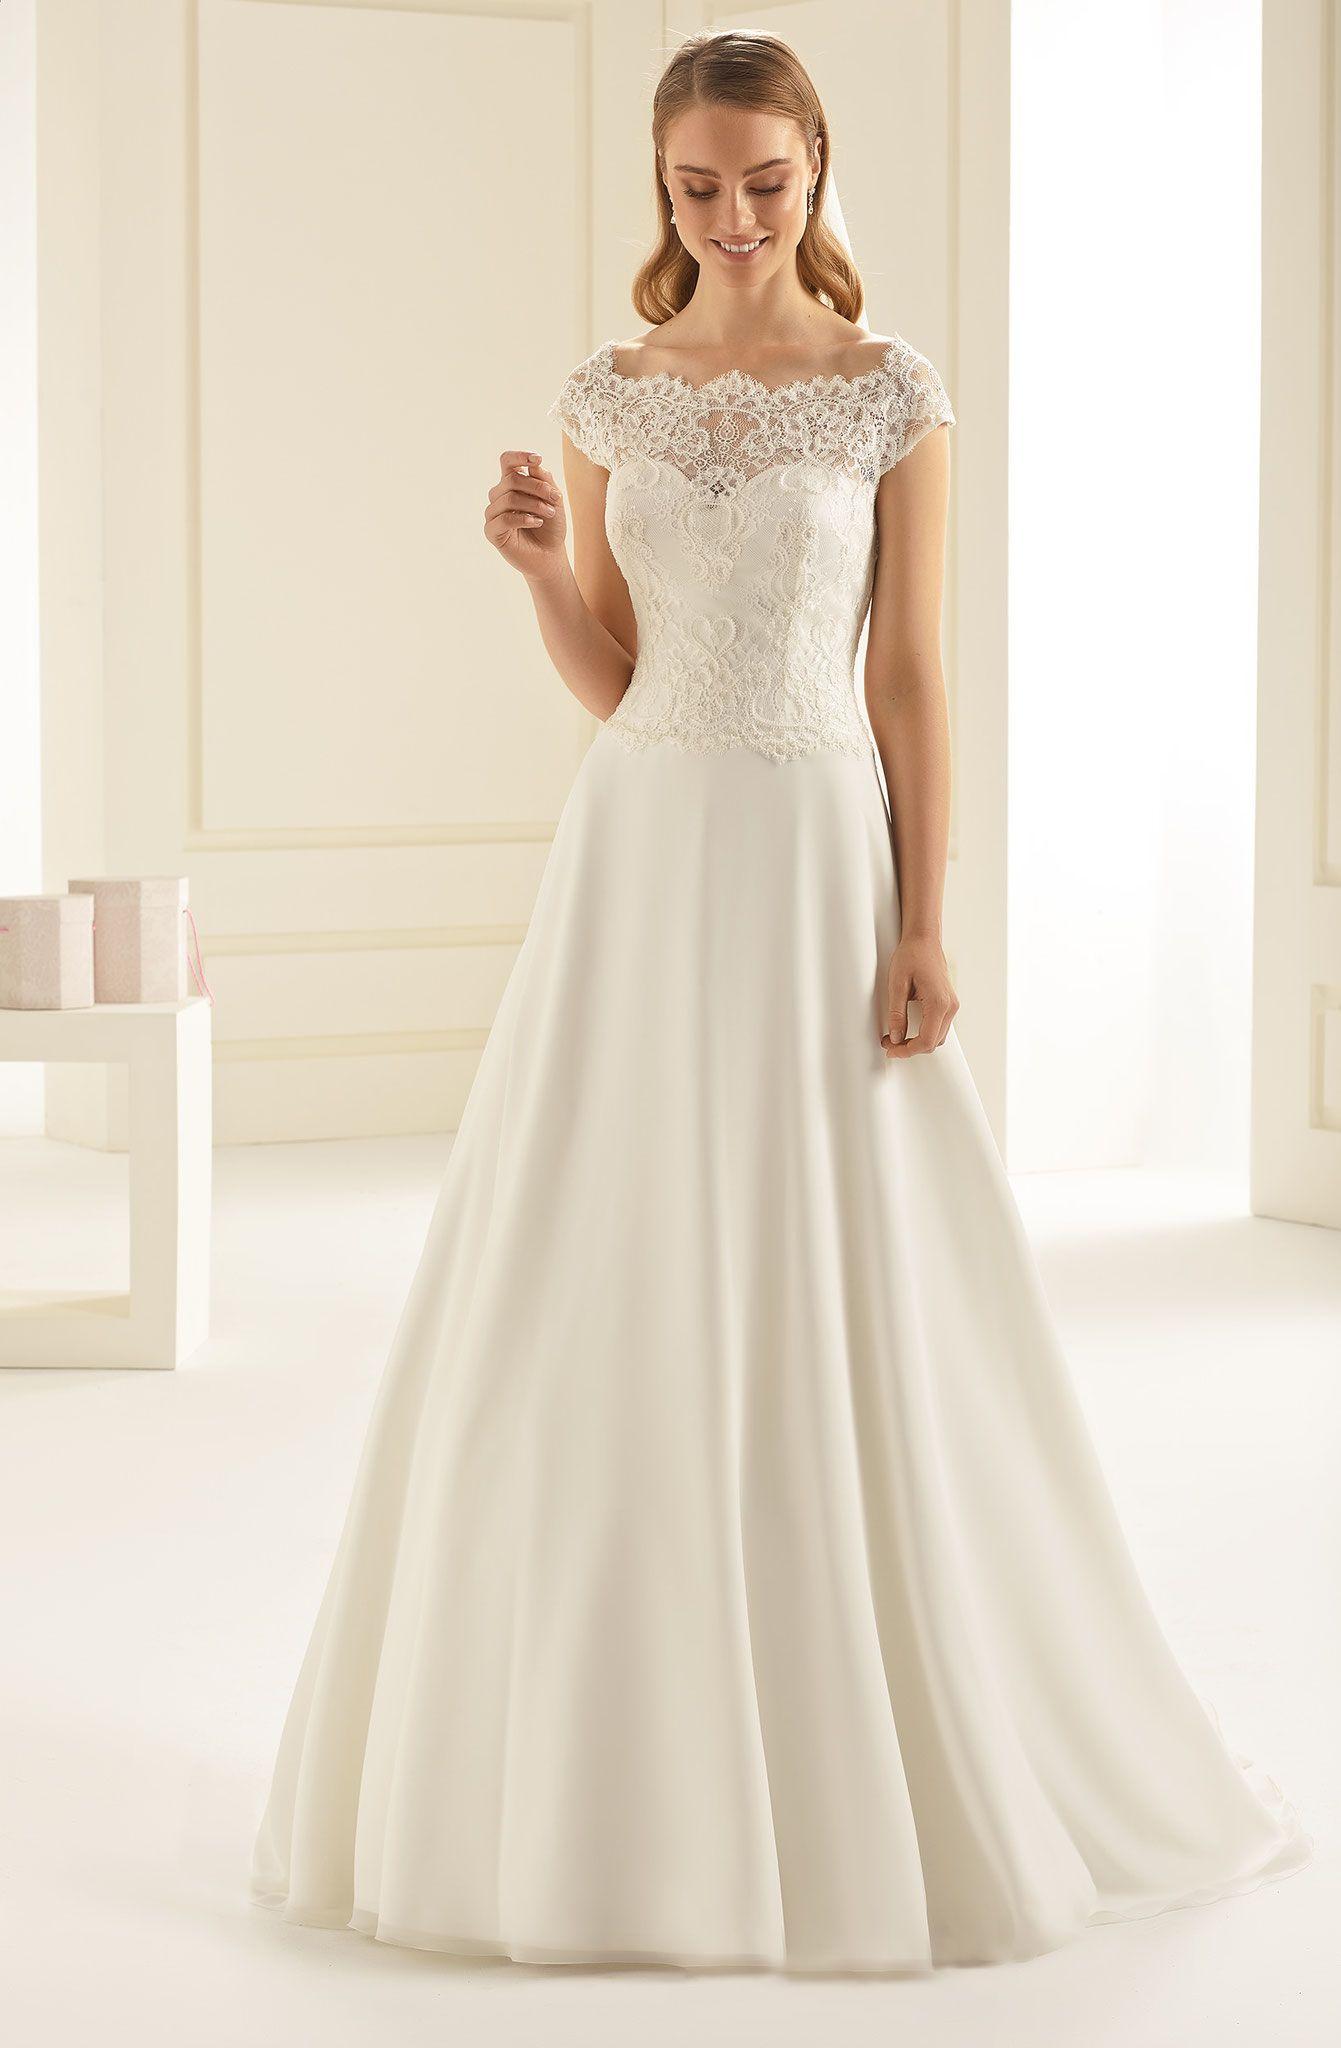 Hochzeitskleider berlin princess dreams